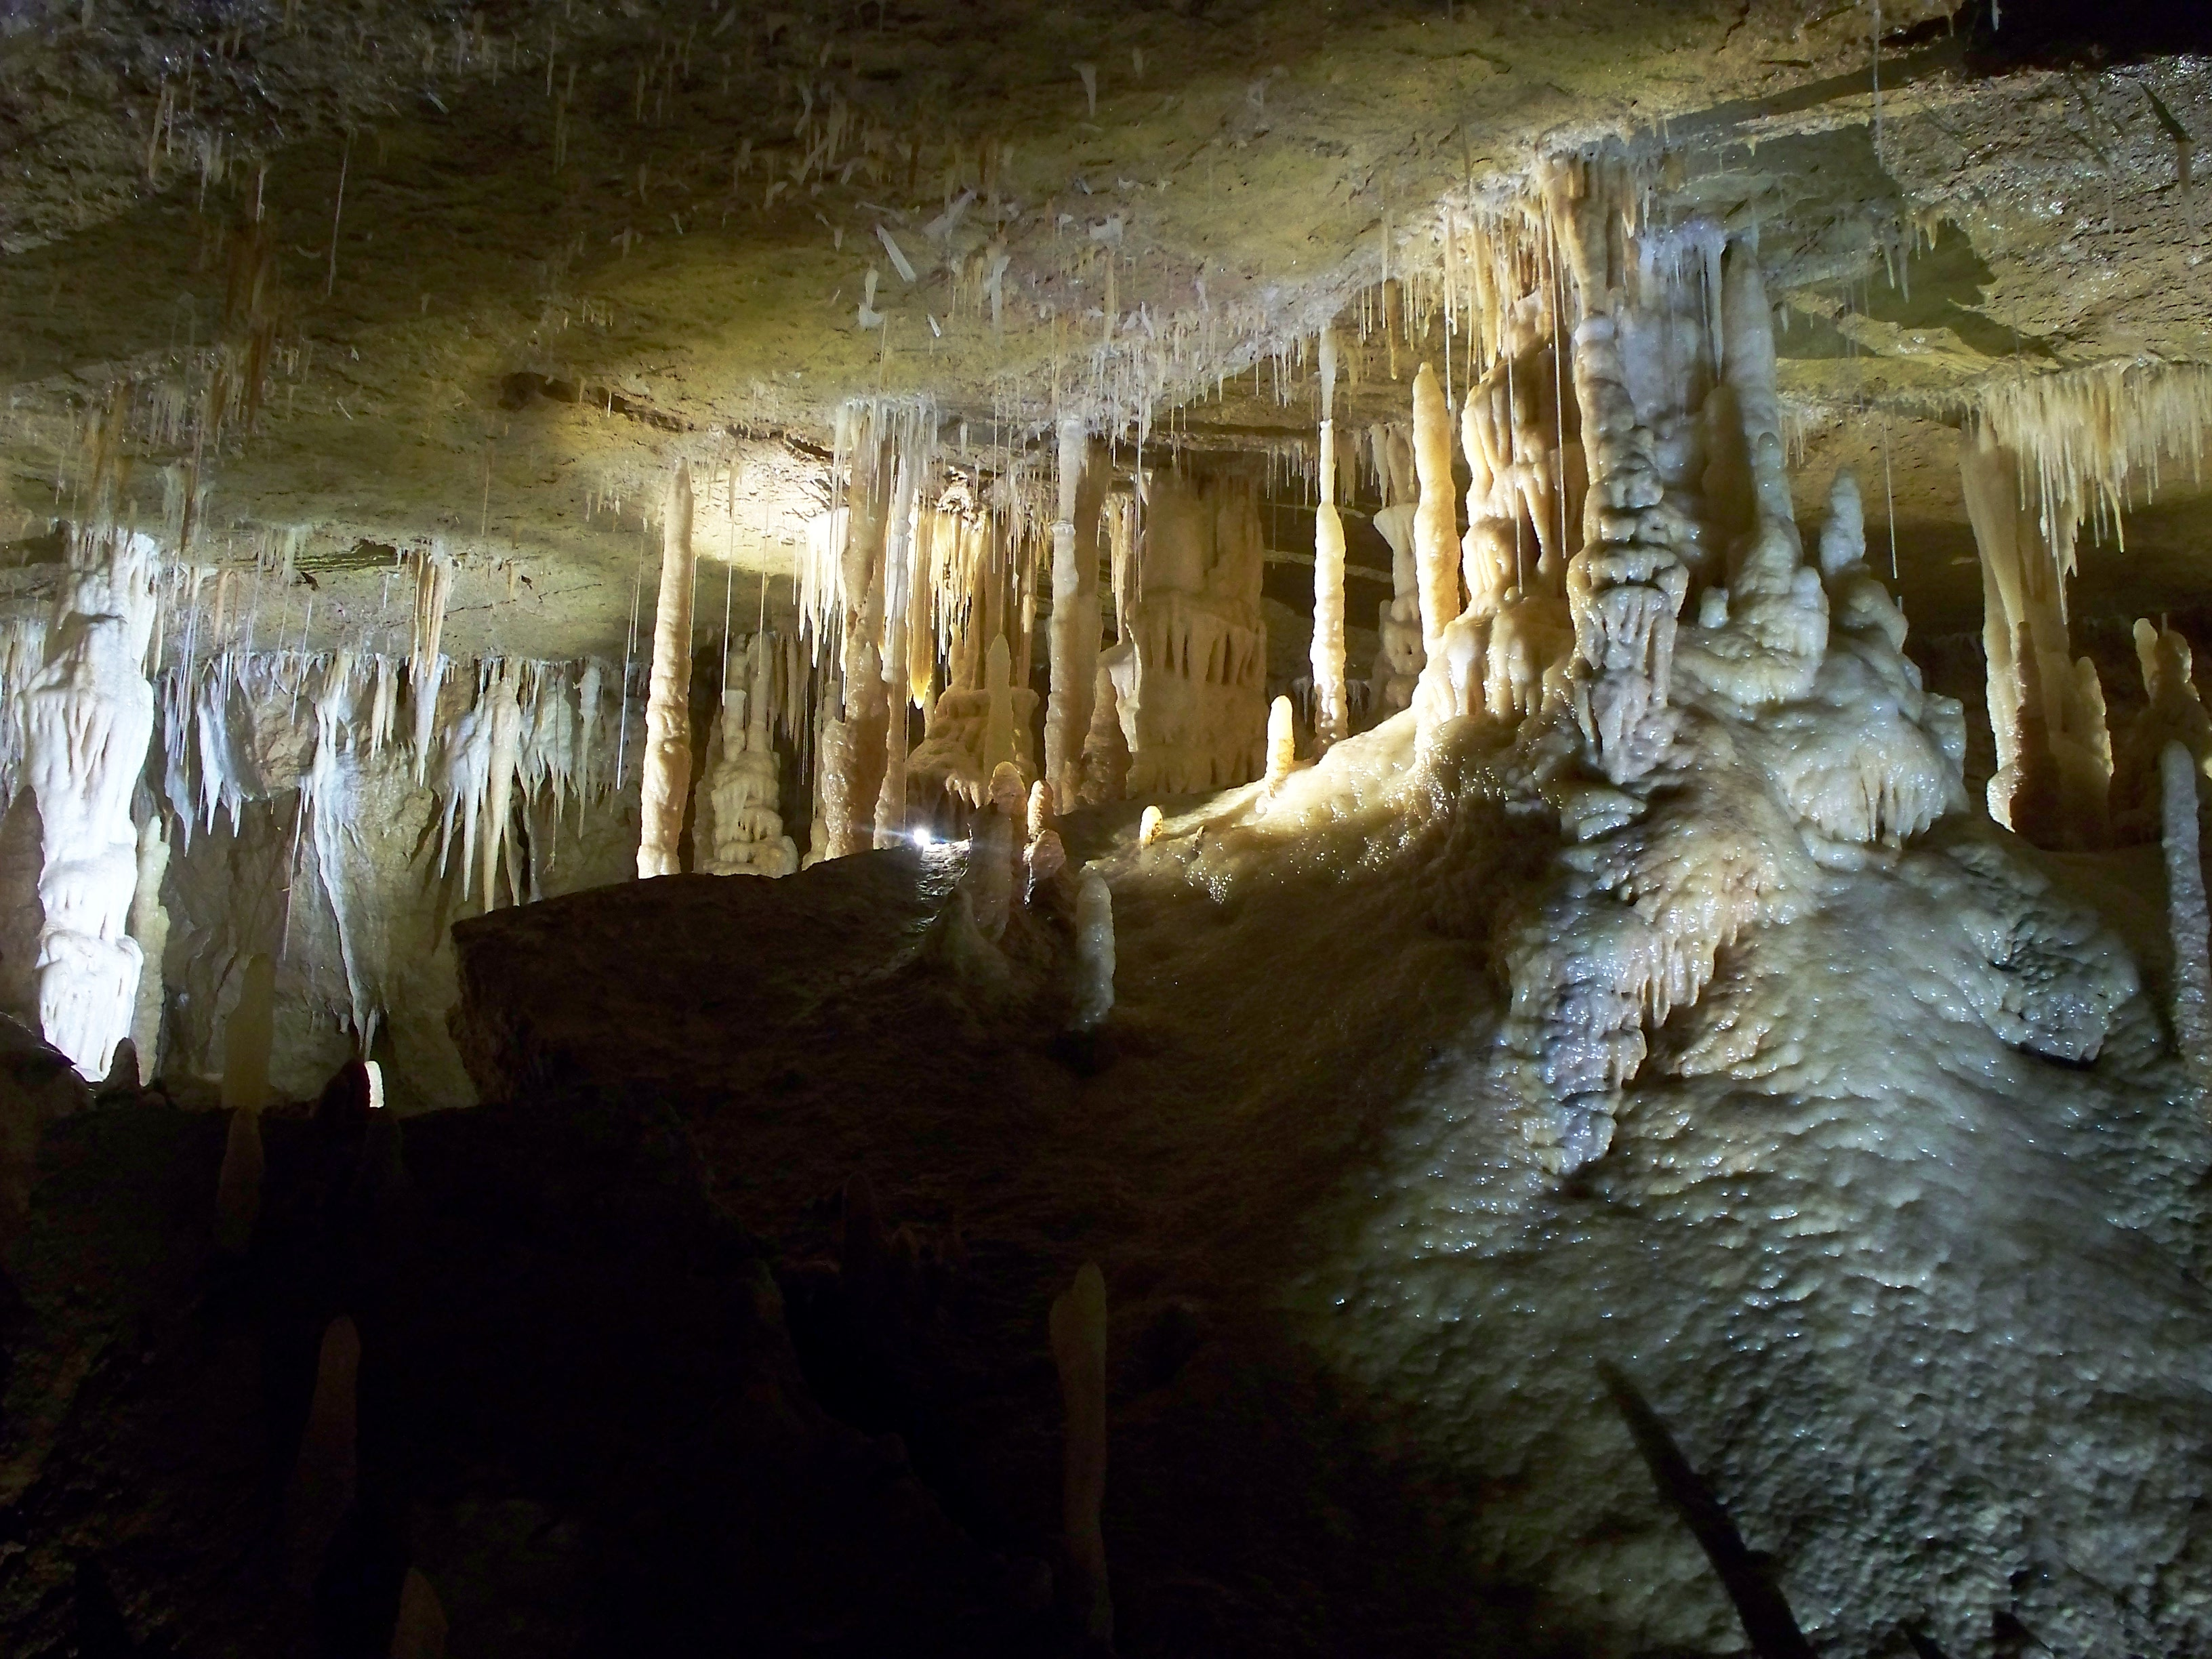 Grotte de Tourtoirac _6_.JPG